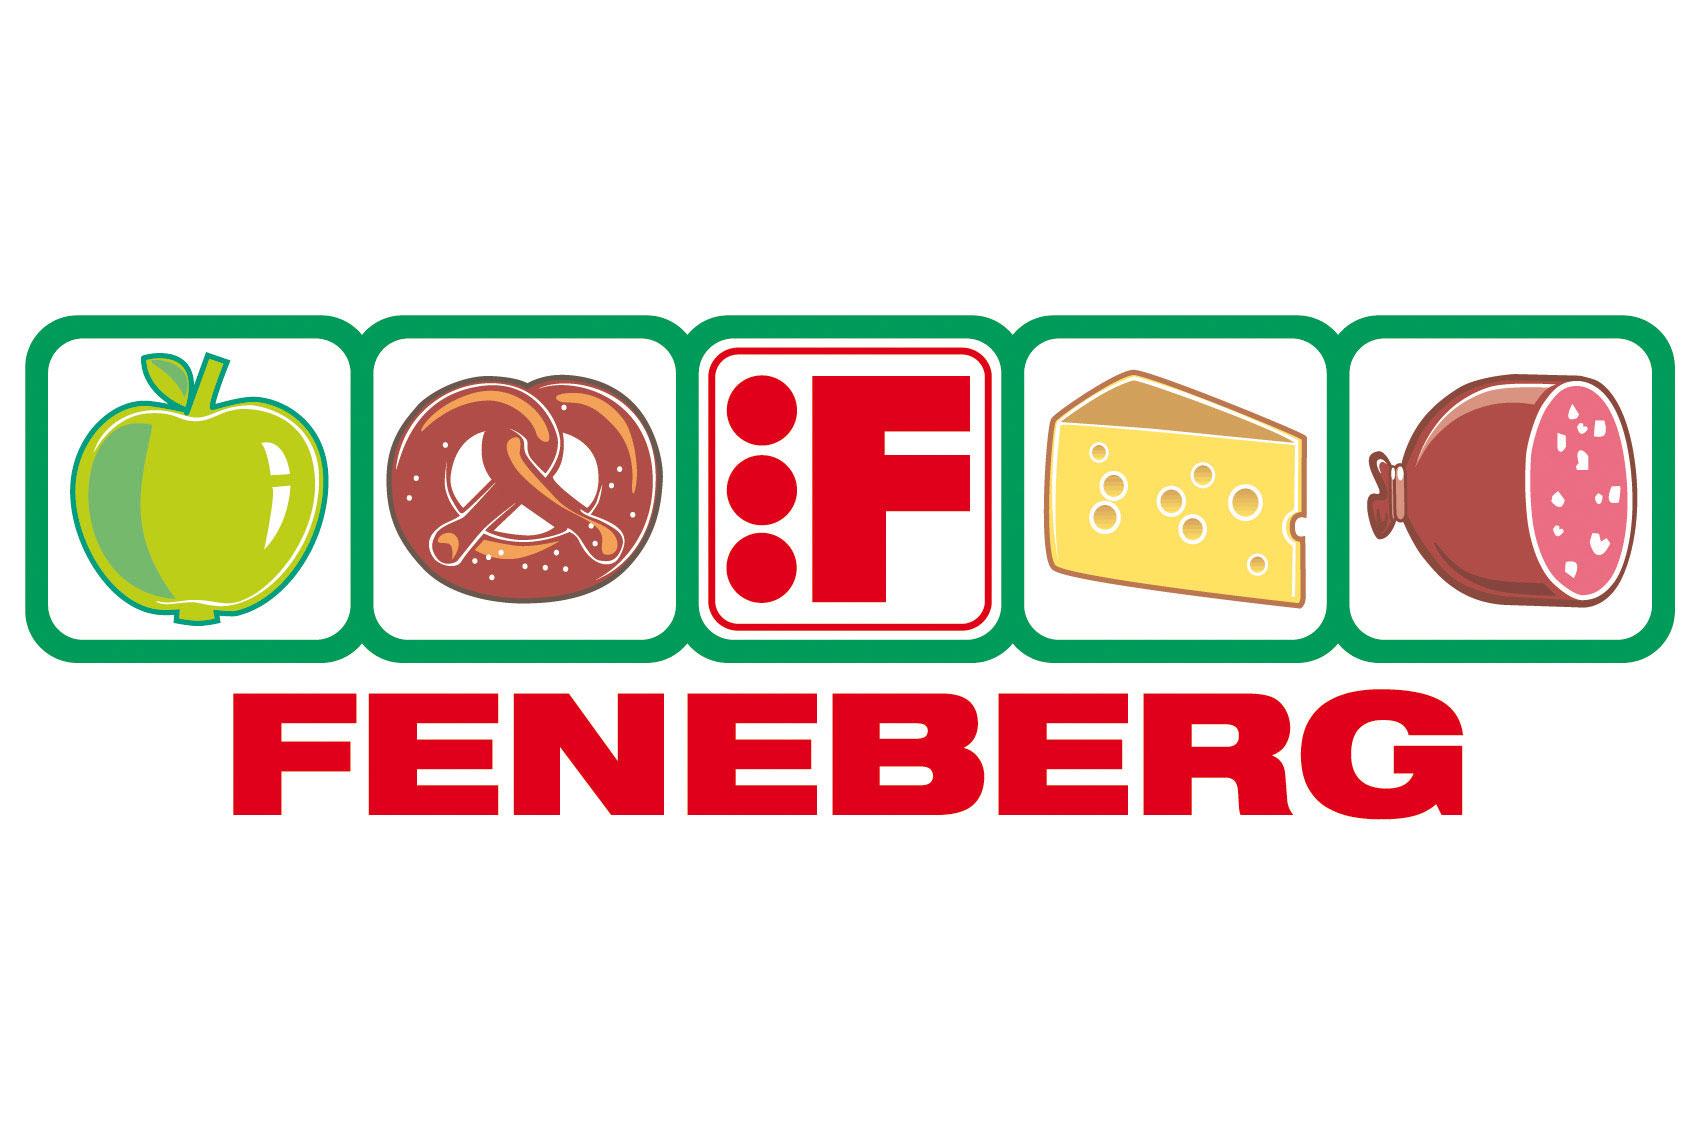 Feneberg